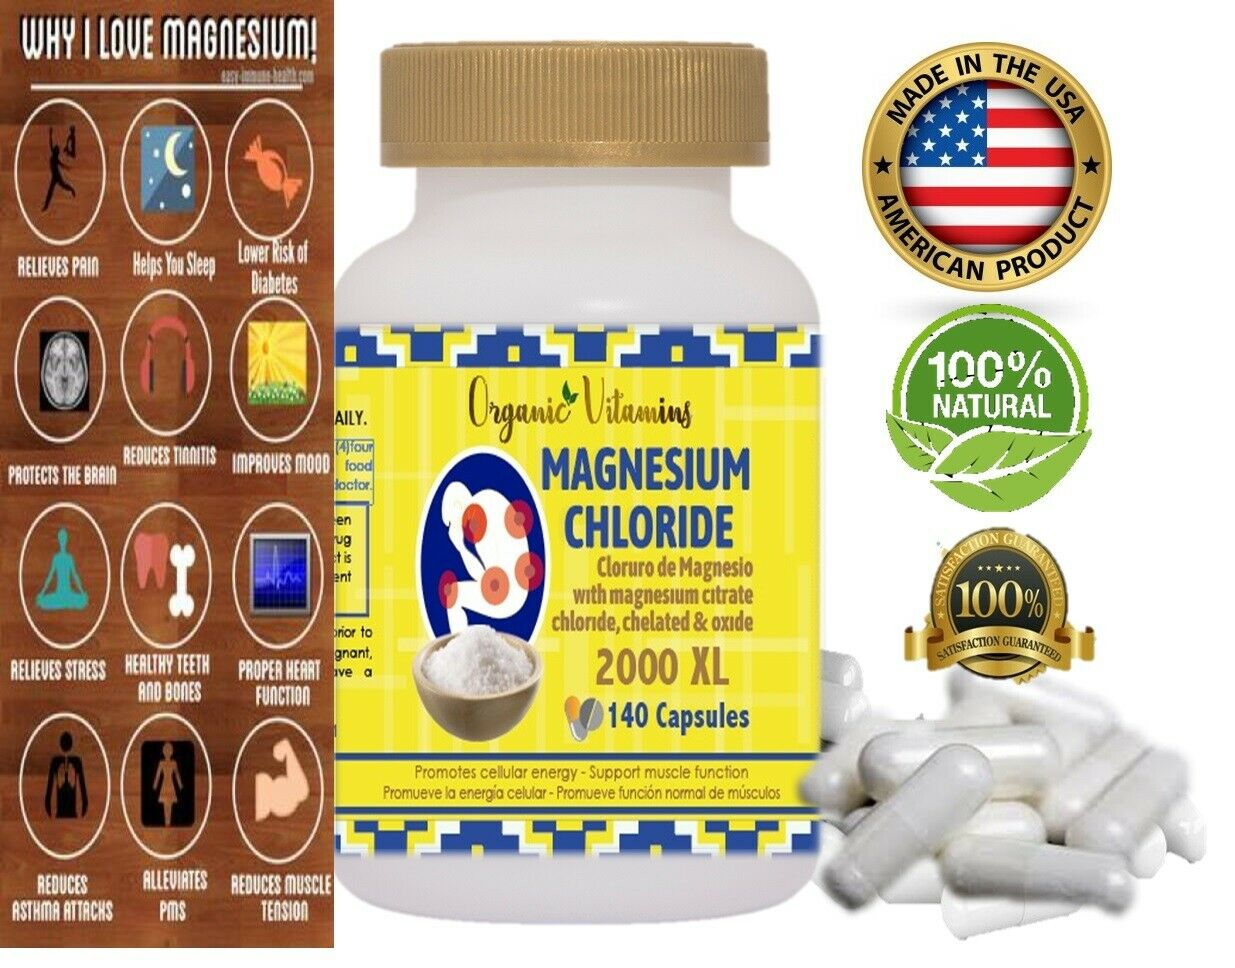 Citrato de Magnesio - 140 capsulas Pastillas de Citrato de Magnesio 2000  4